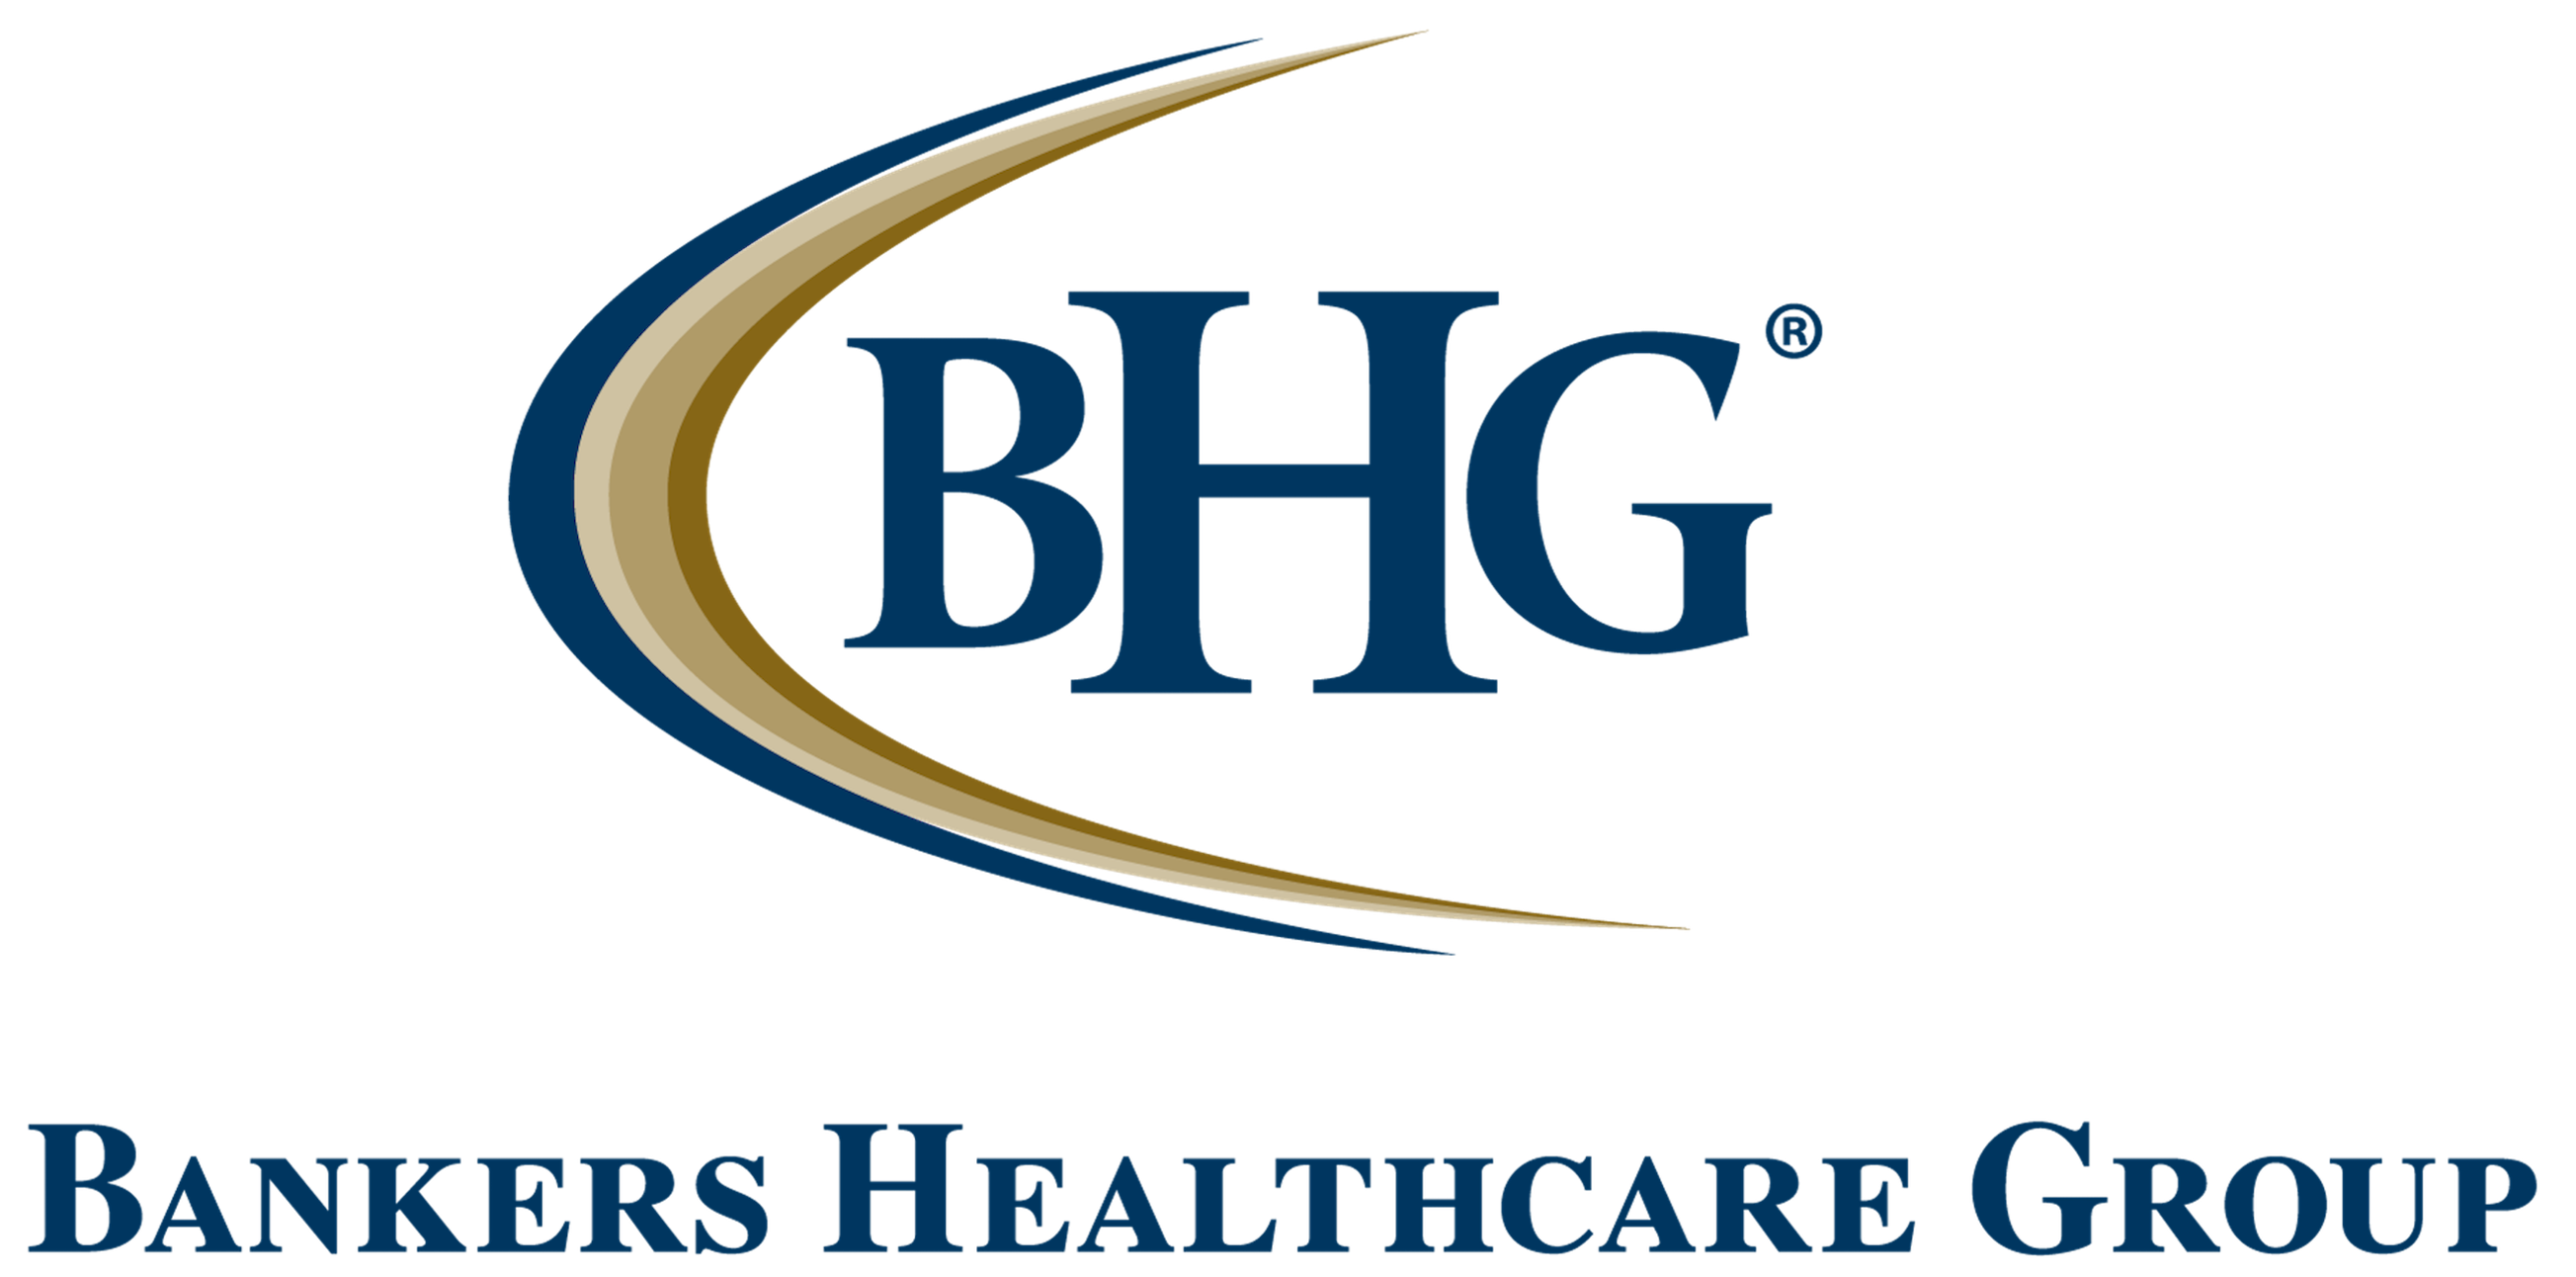 bhg-logo